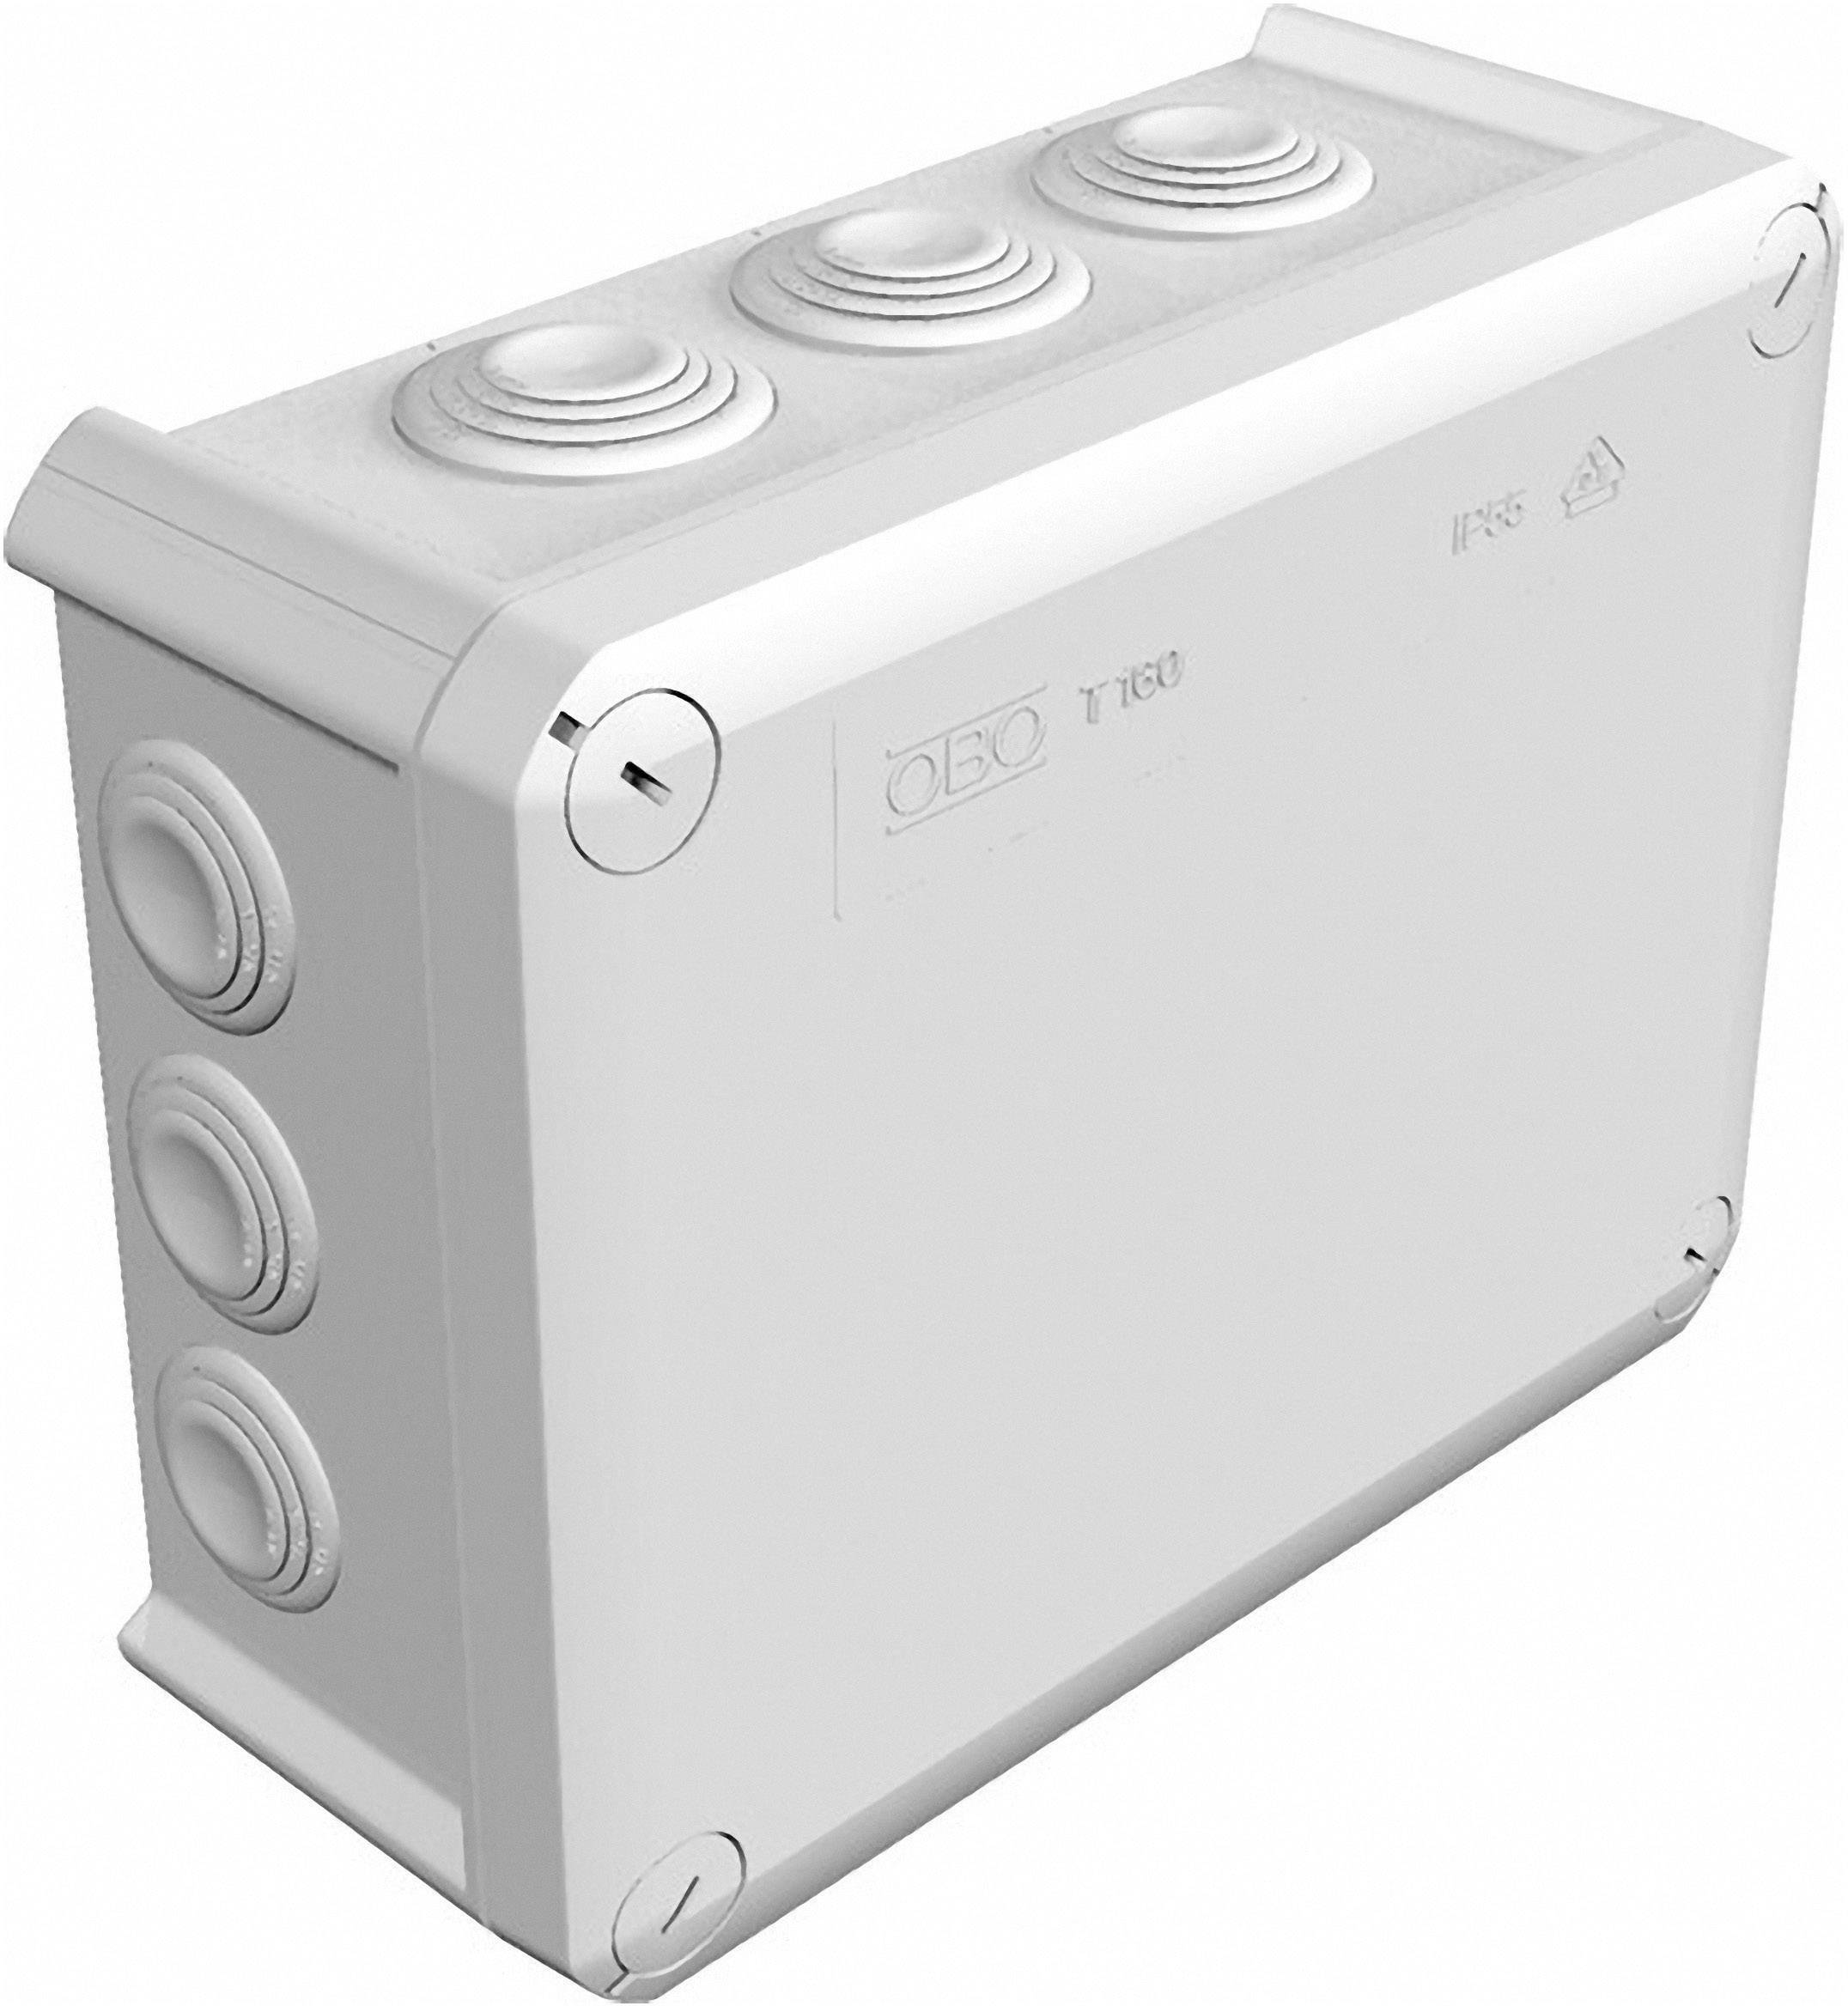 Rozbočovacia krabica OBO Bettermann T160, IP66, 190x 150x 77 mm, svetlo sivá, 2007093